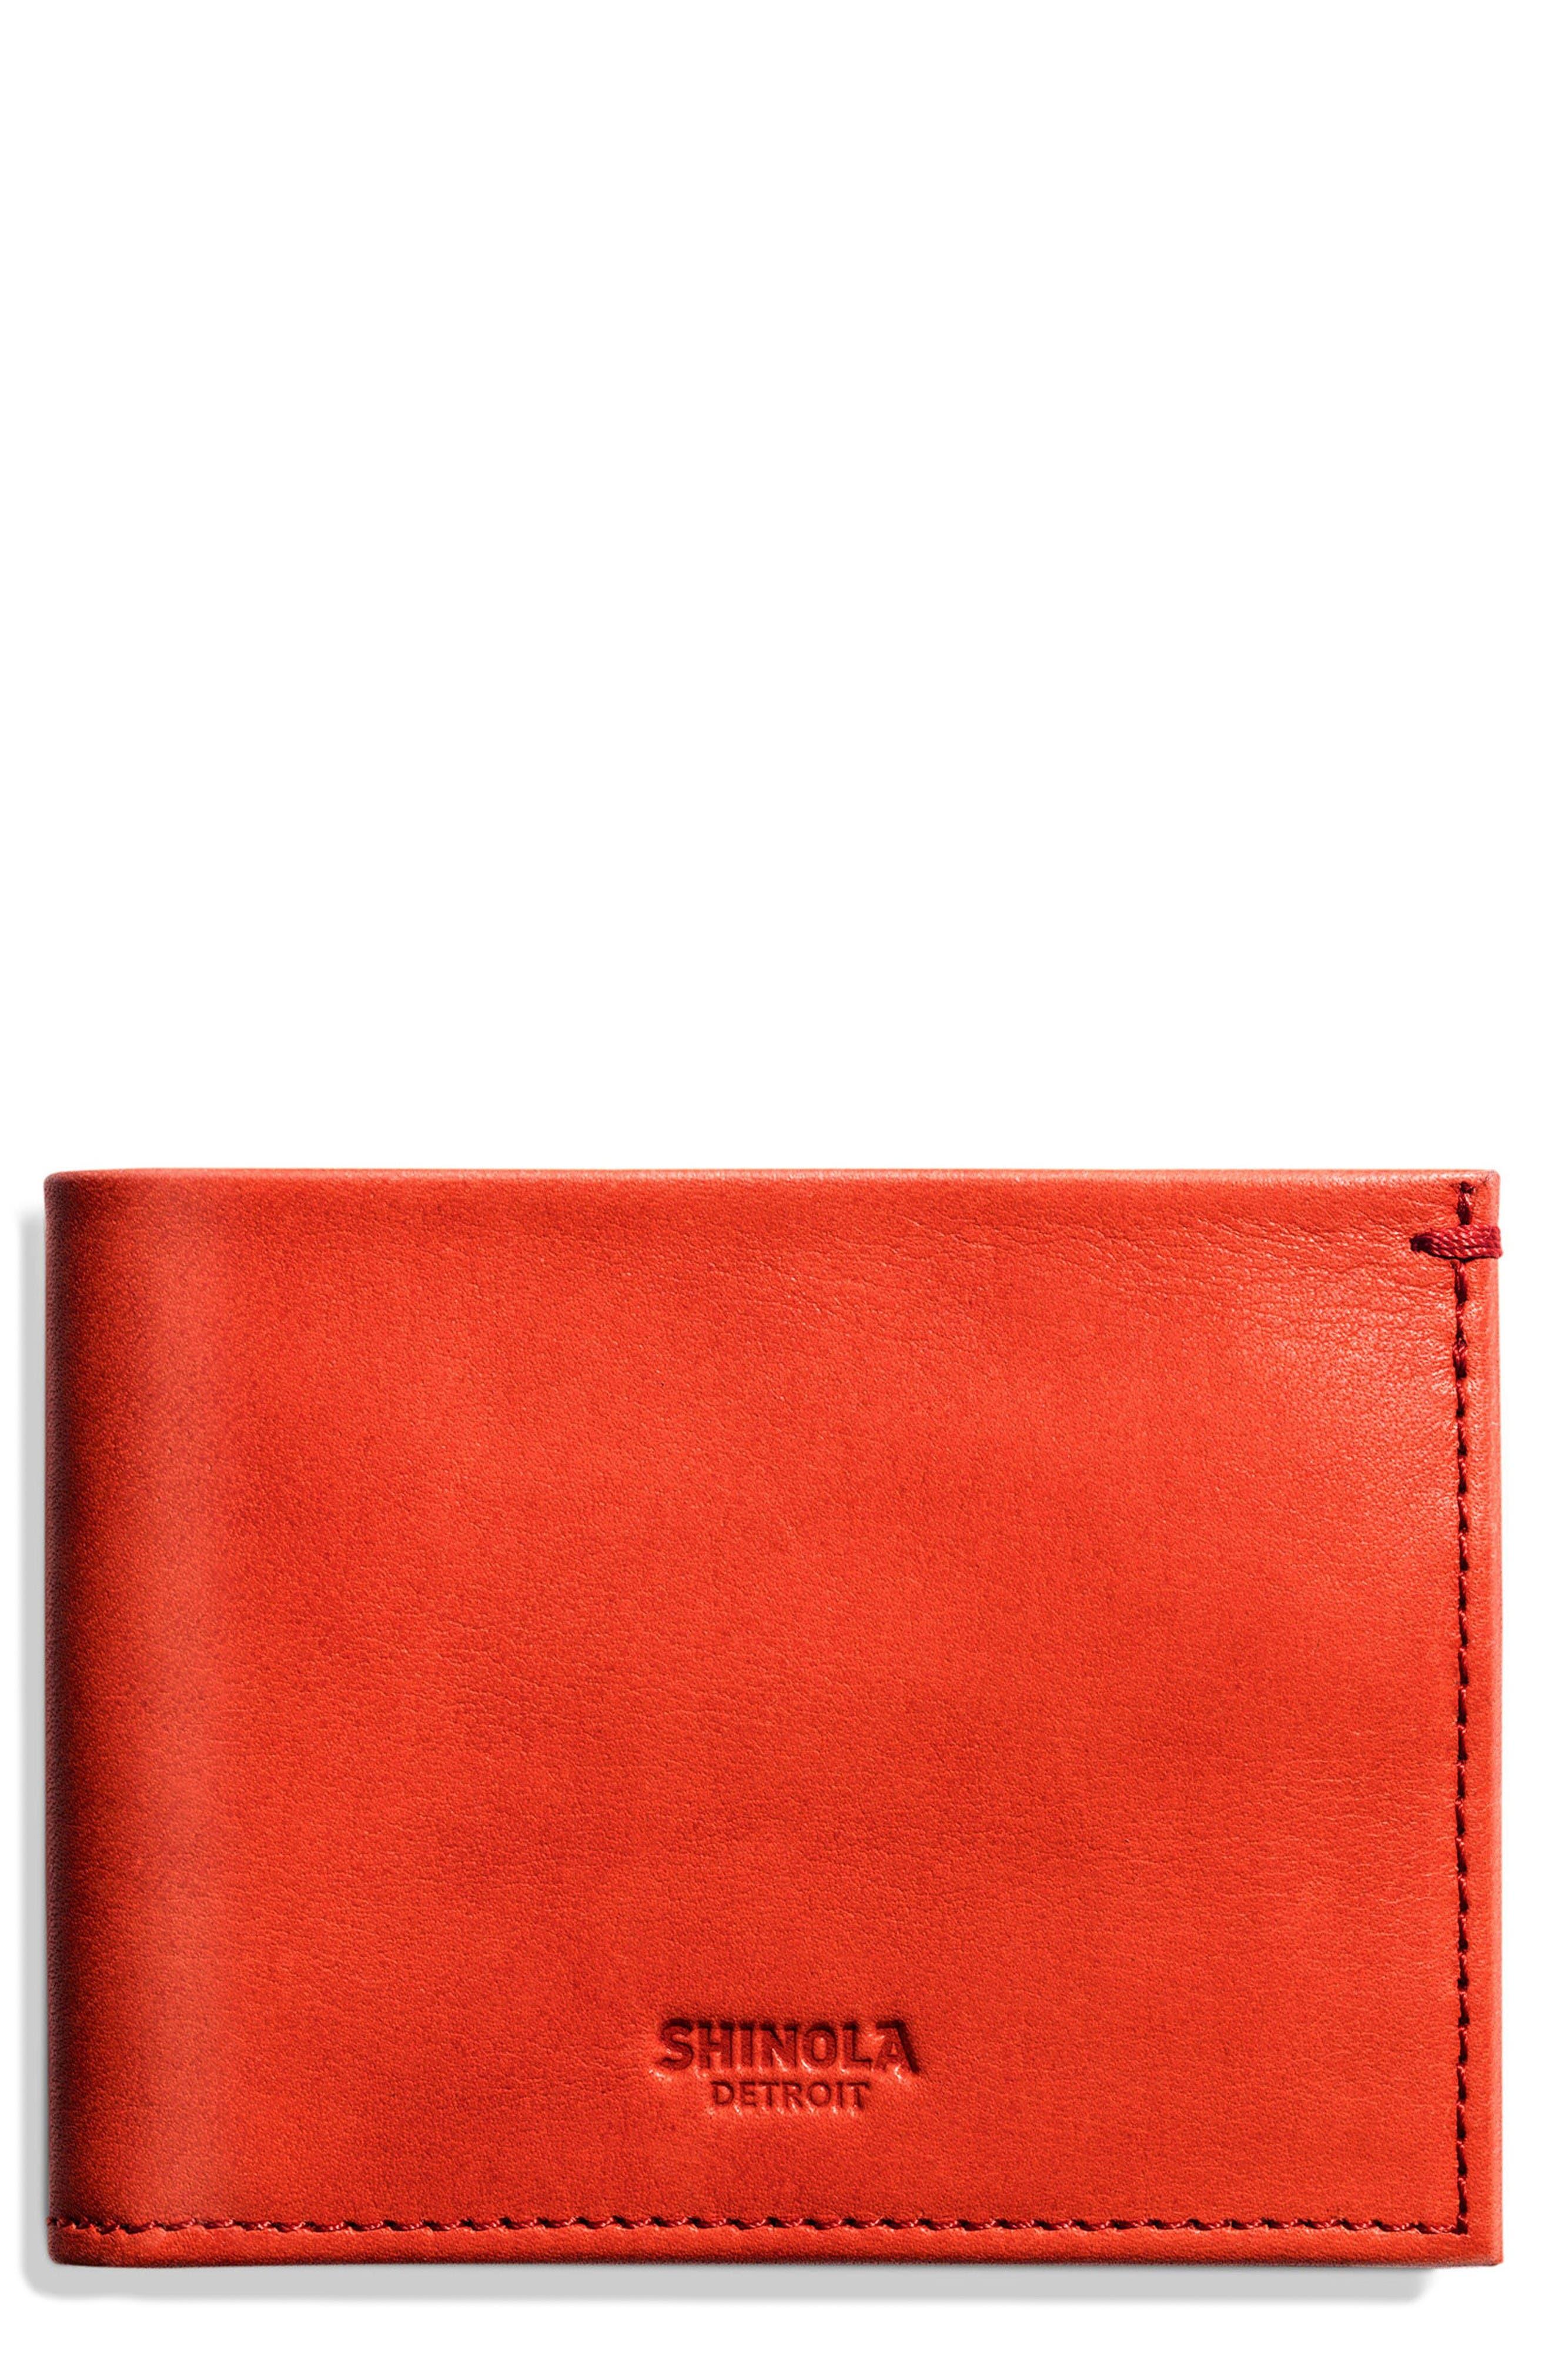 Main Image - Shinola Slim Bifold Leather Wallet